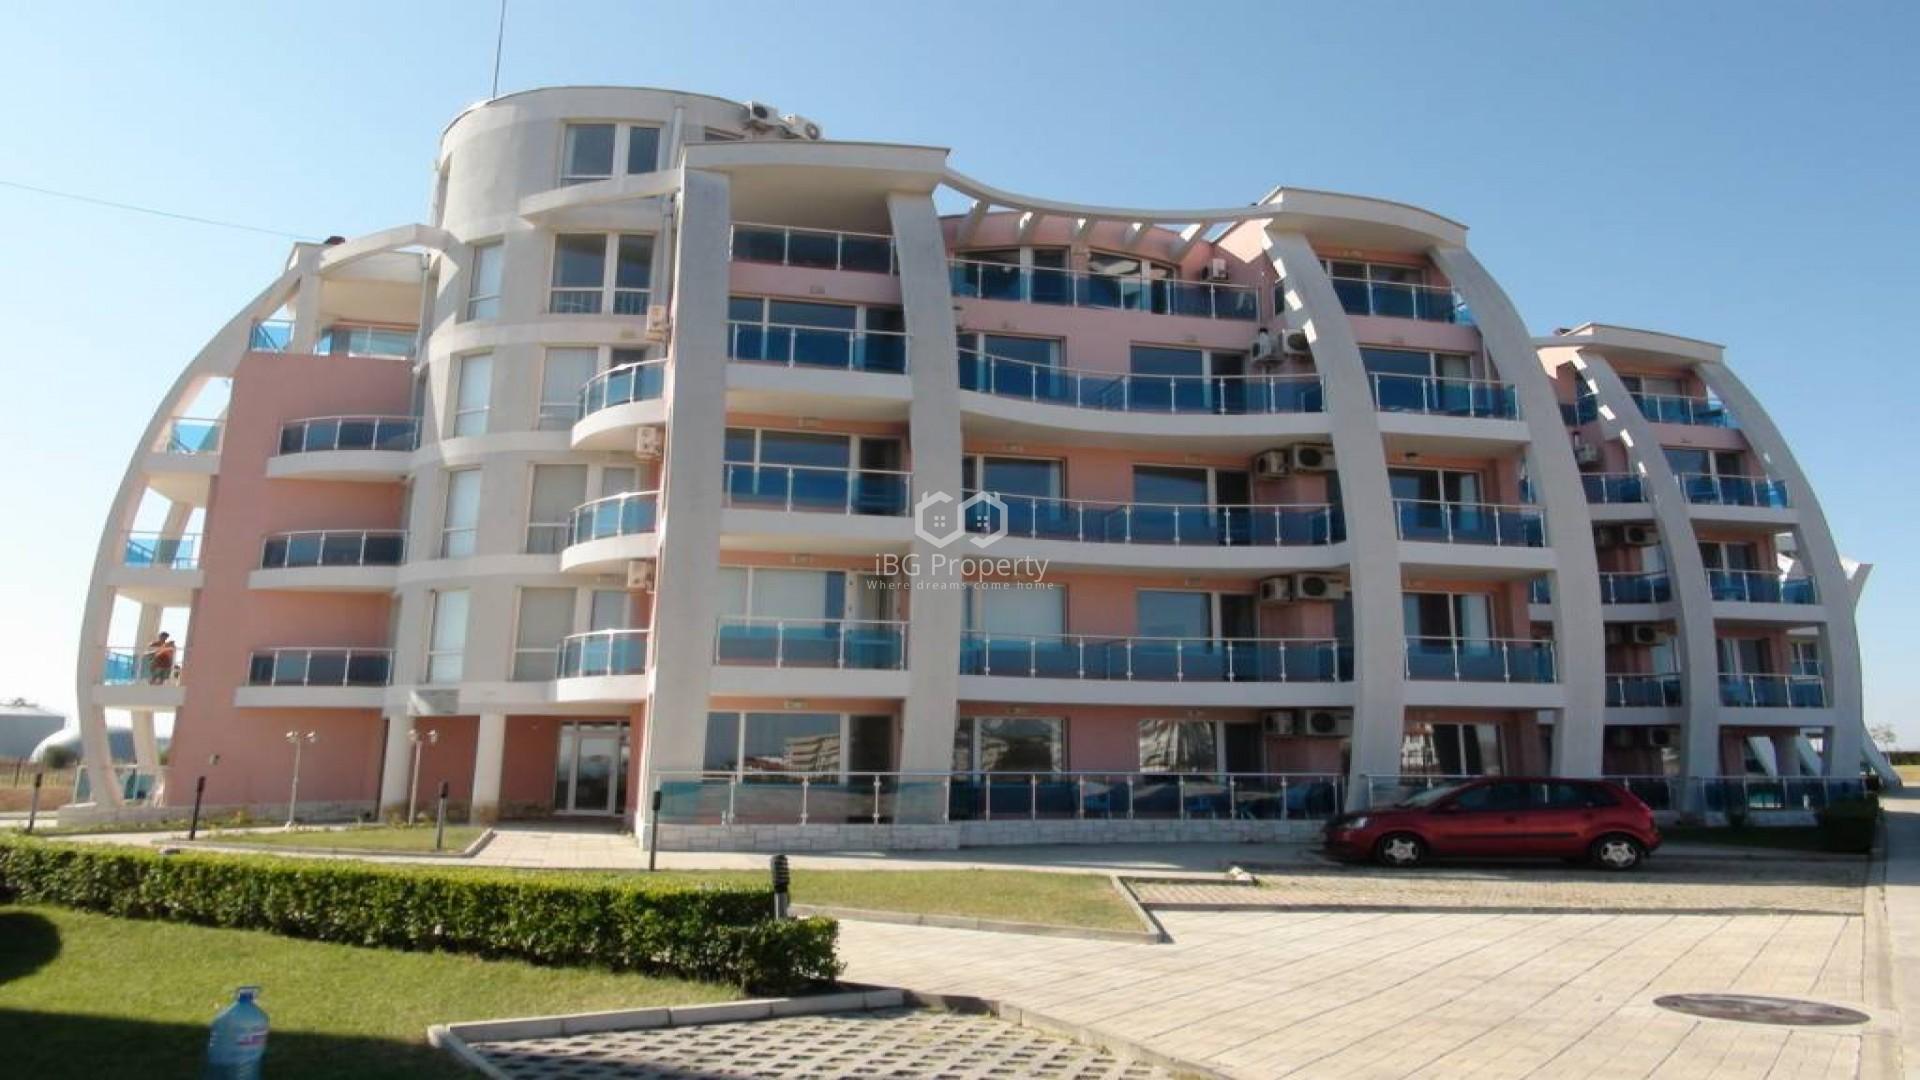 Двухкомнатная квартира Ахелой 95 m2